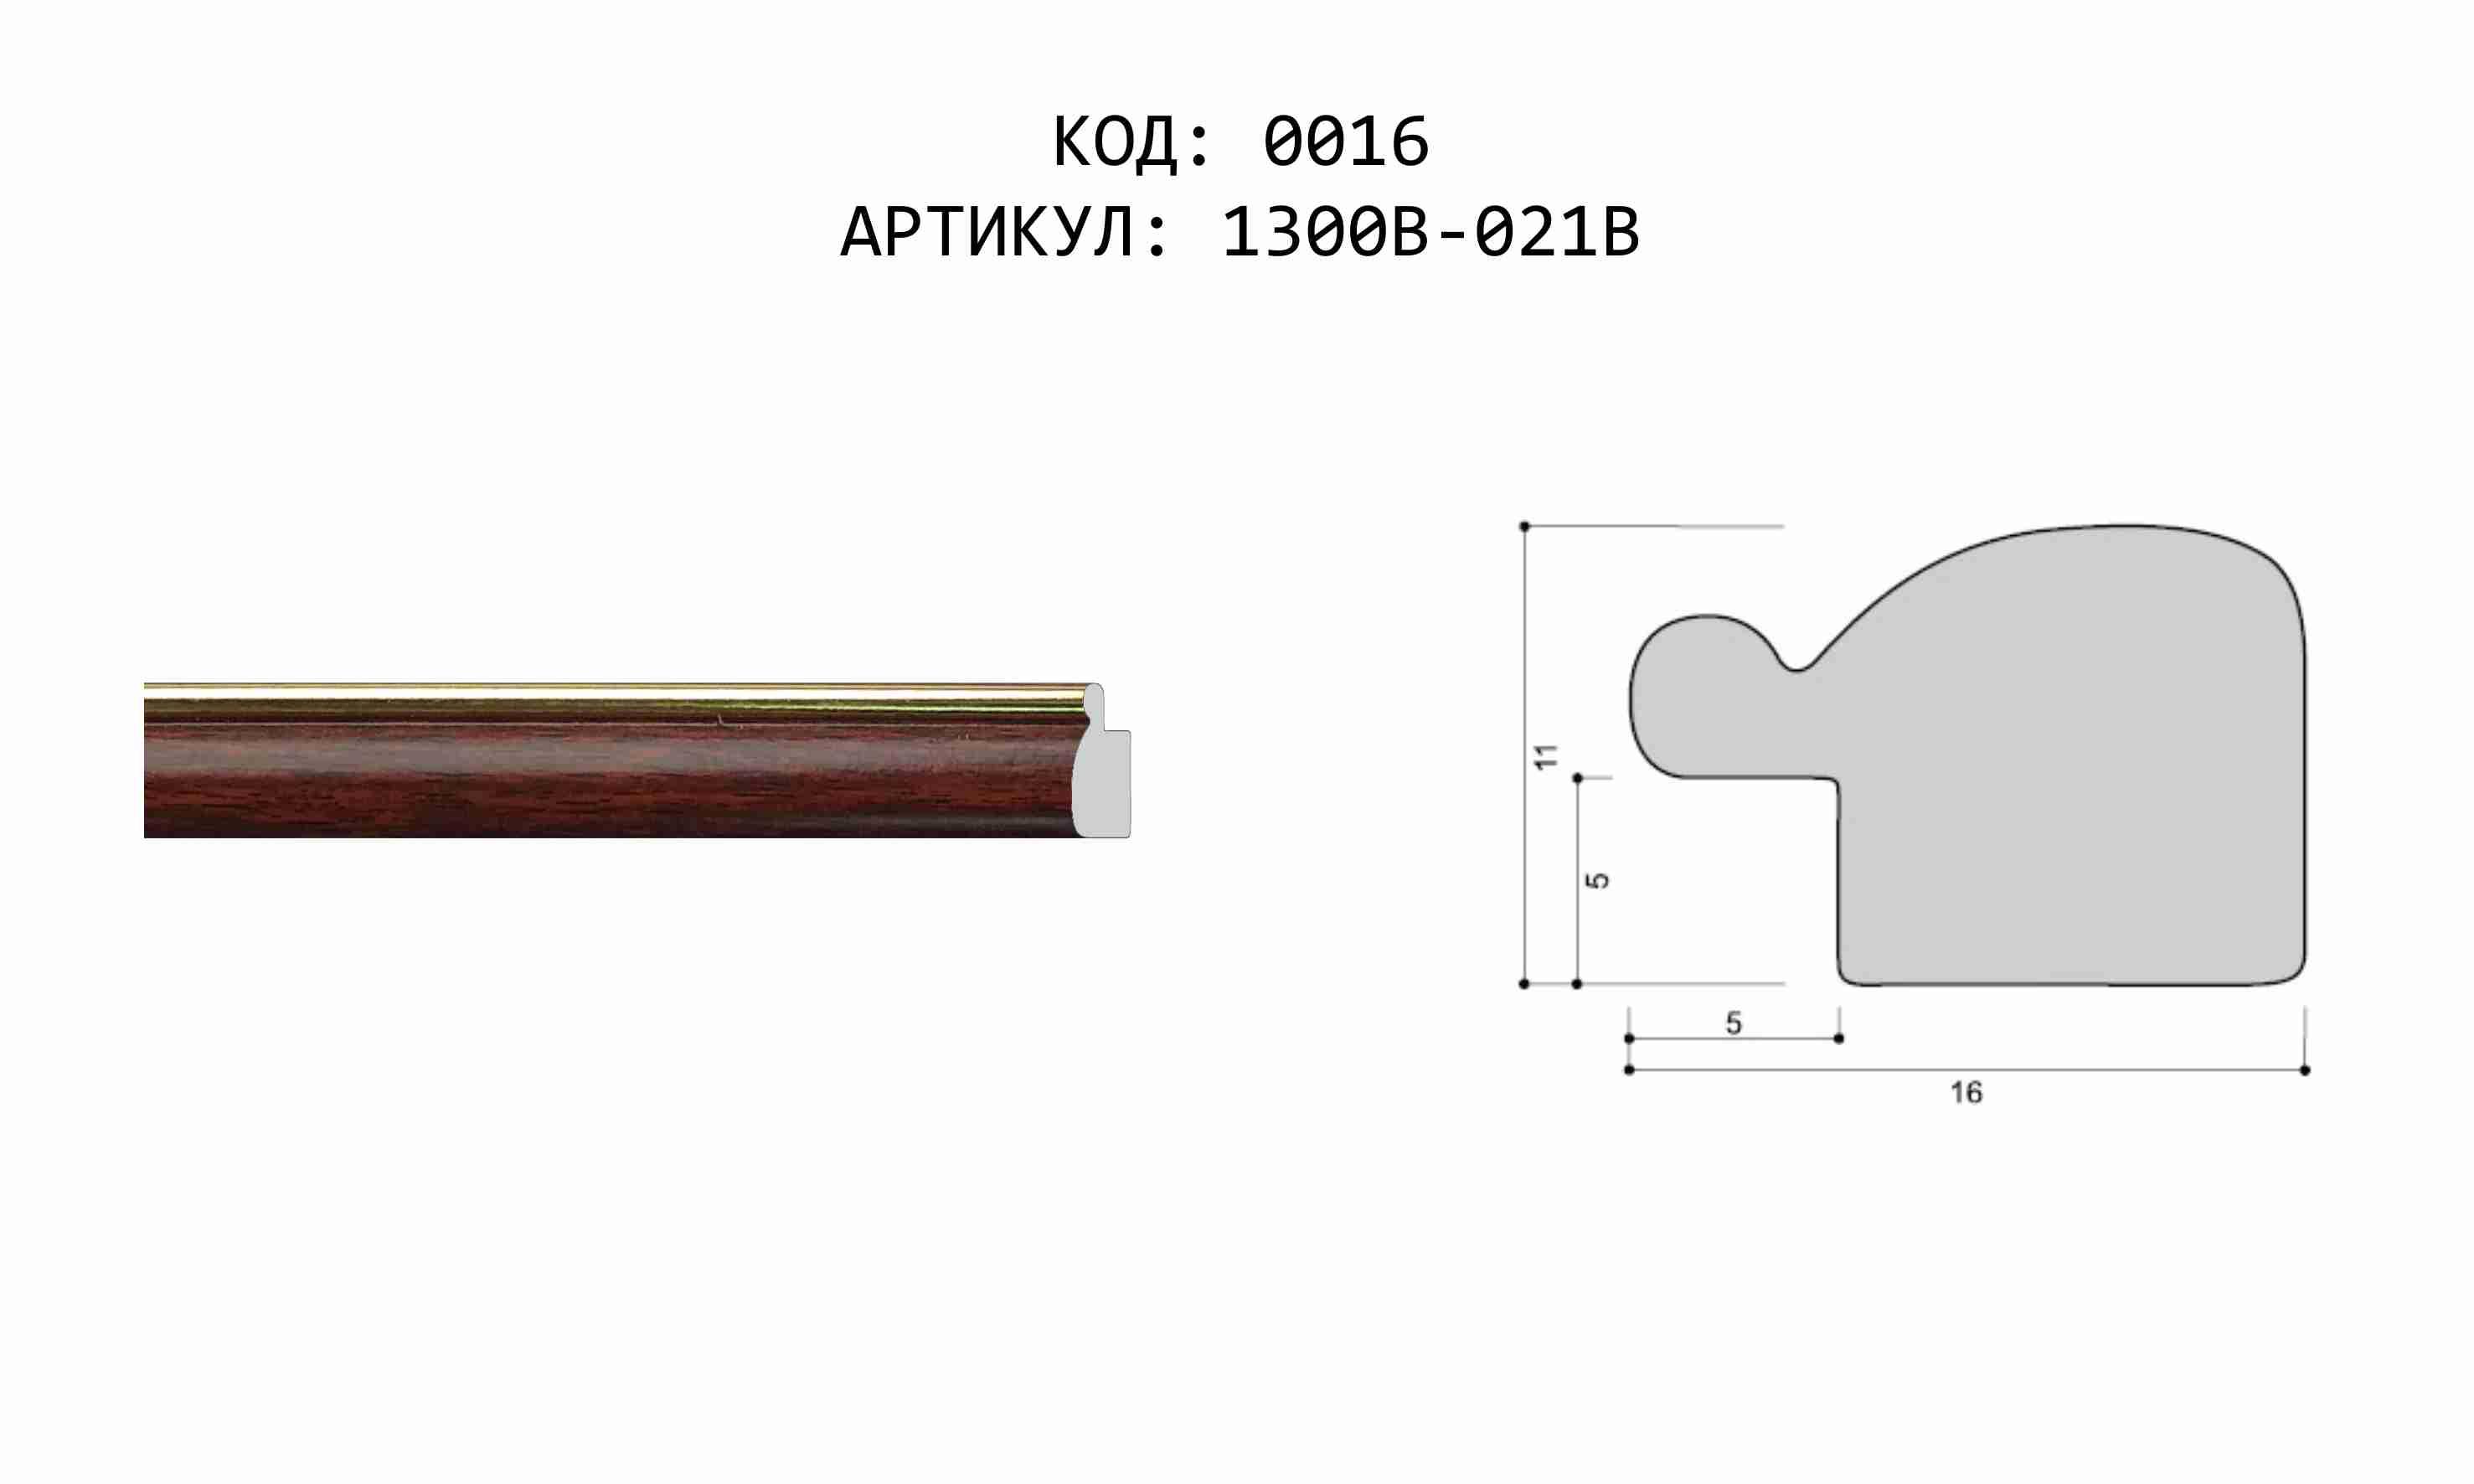 Артикул: 1300B-021B